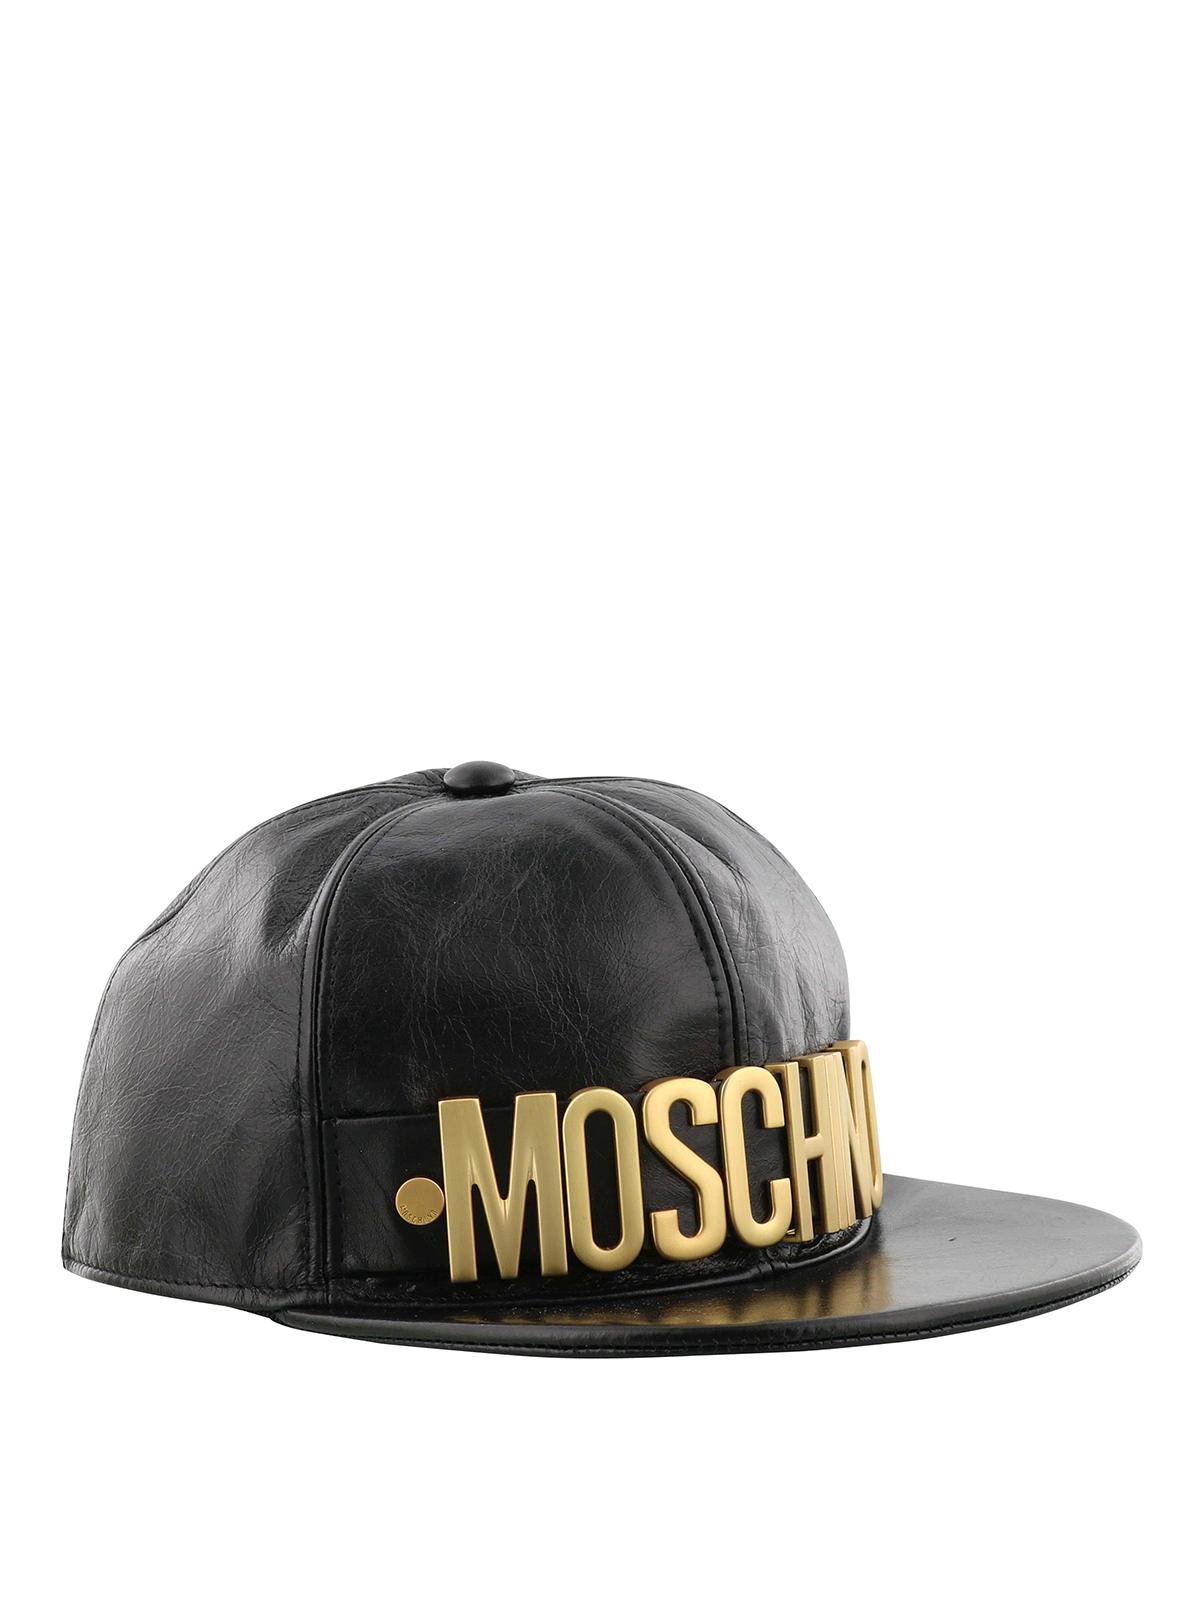 4effa4b0b9a Moschino - Gold-tone logo crackle leather baseball cap - hats   caps ...